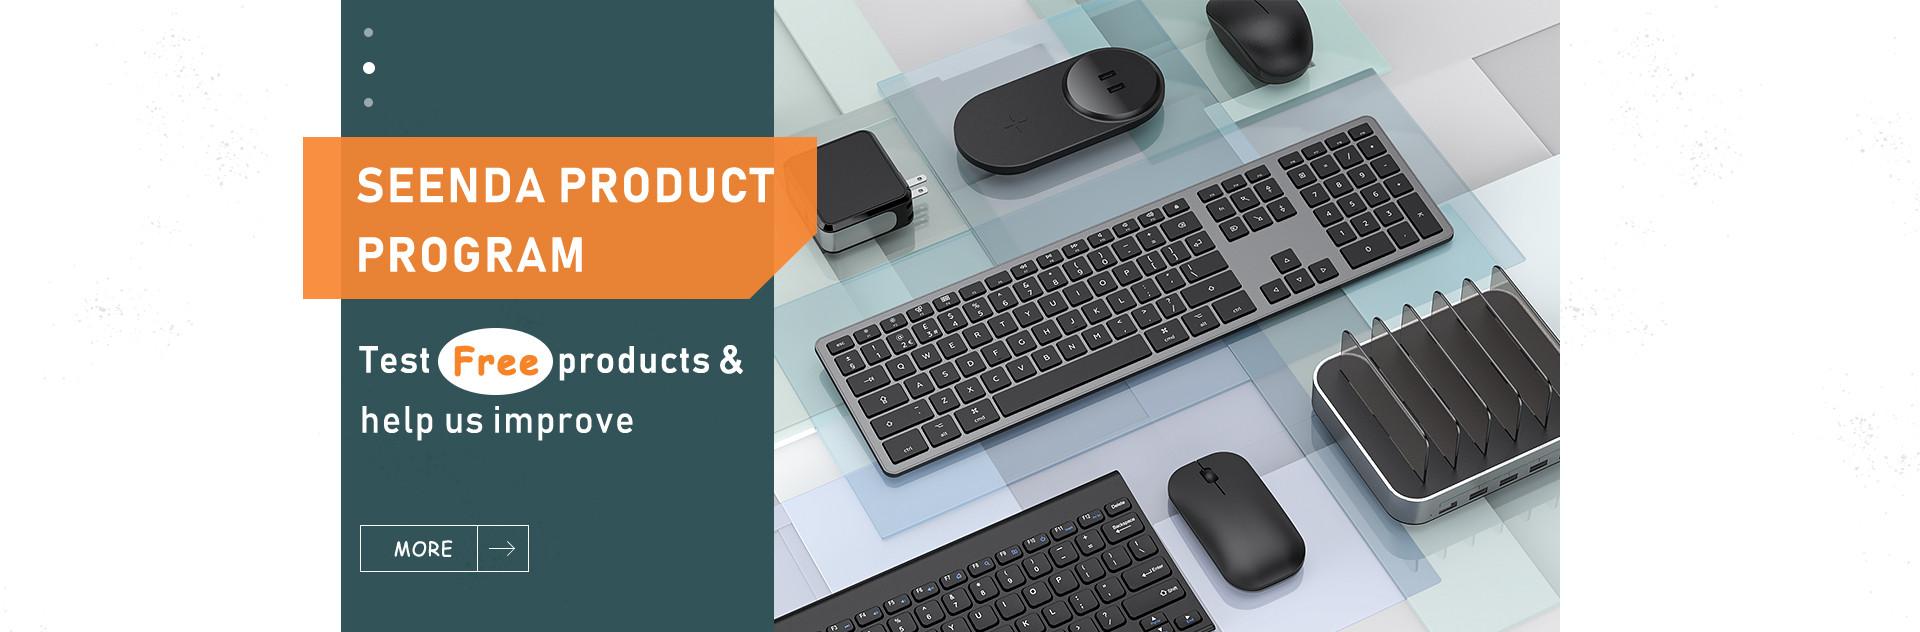 Seenda product program